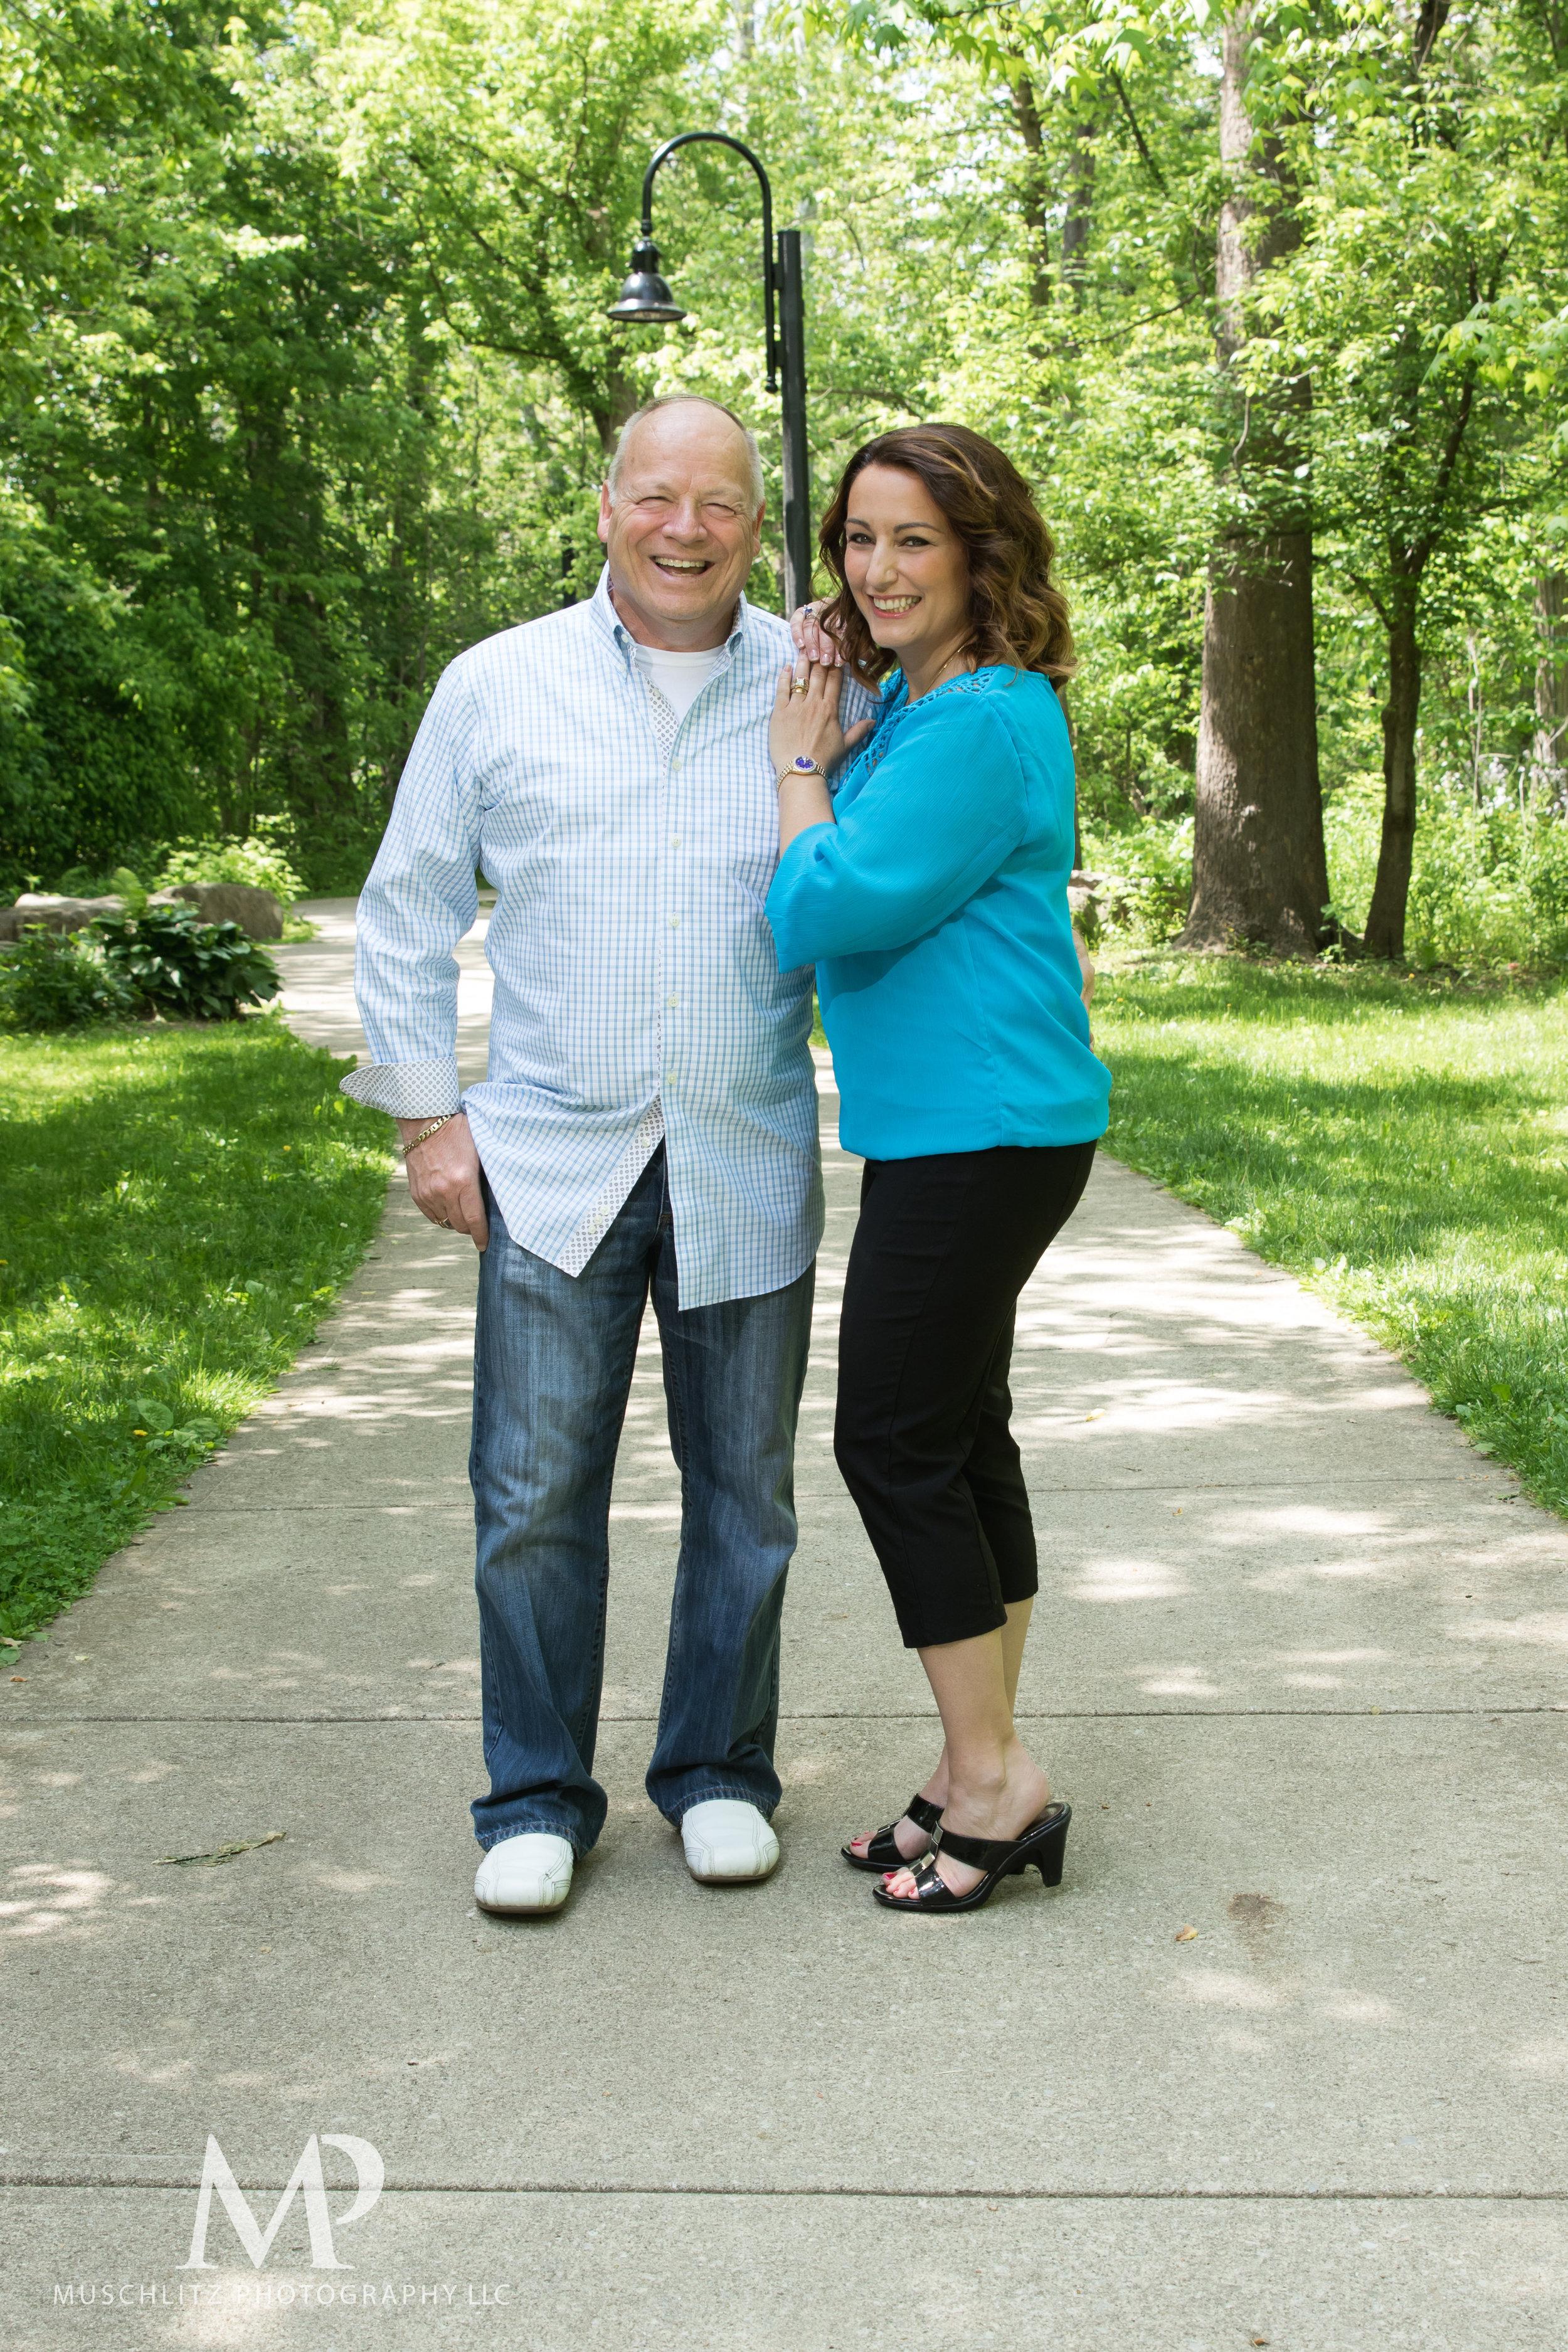 anniversary-couple-portrait-session-creekside-park-plaza-gahanna-ohio-boxer-dog-muschlitz-photography-003.JPG